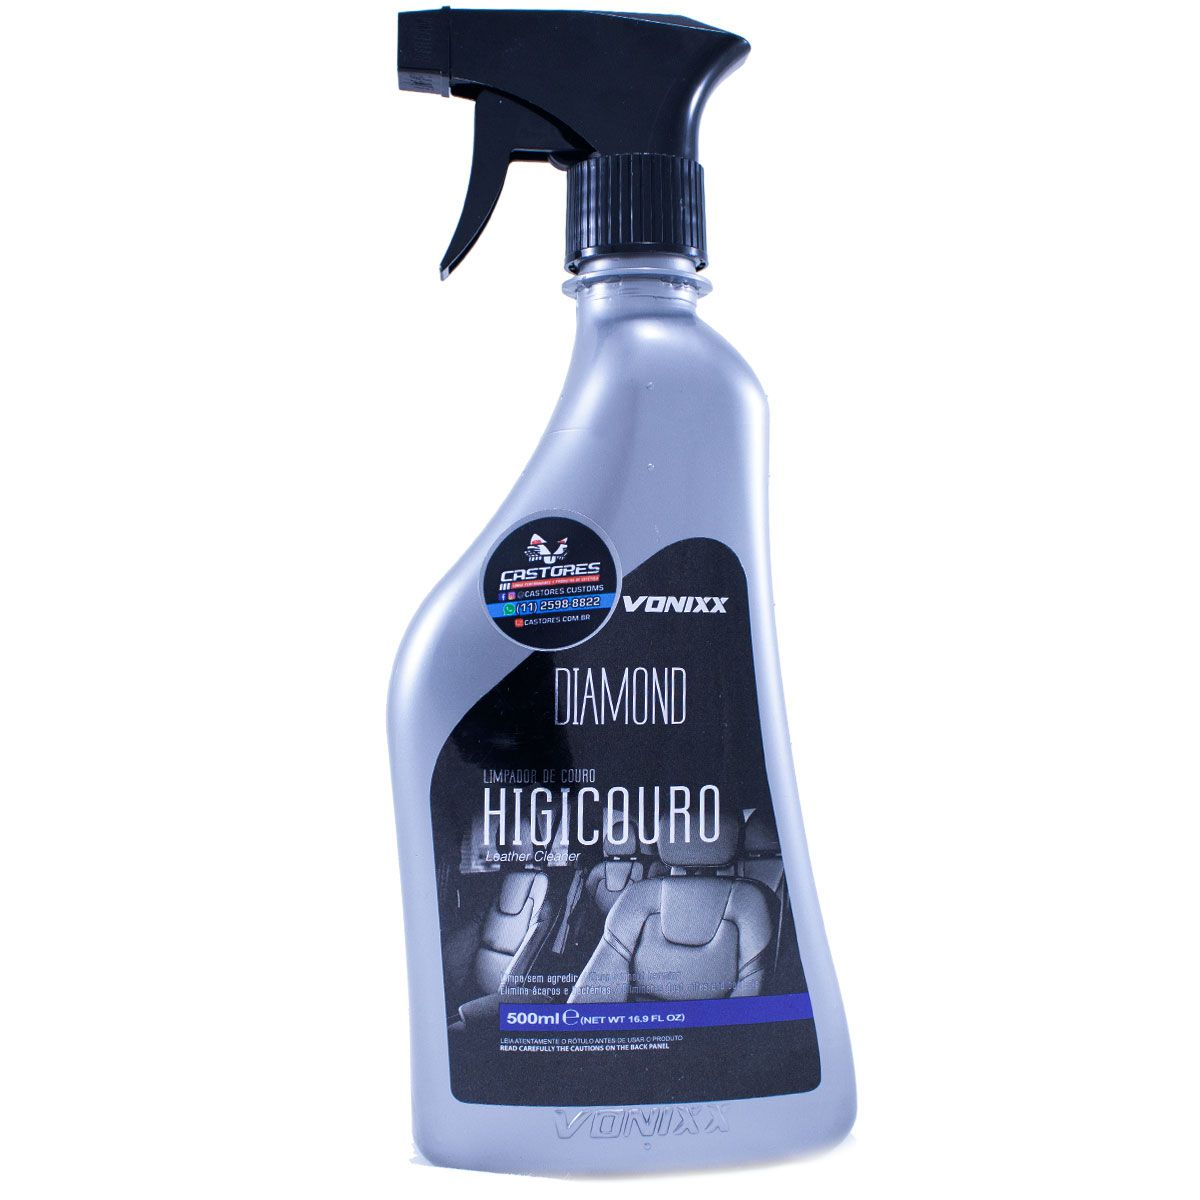 Higicouro Spray Limpa Couro Natural E Sintético Vonixx 500ml